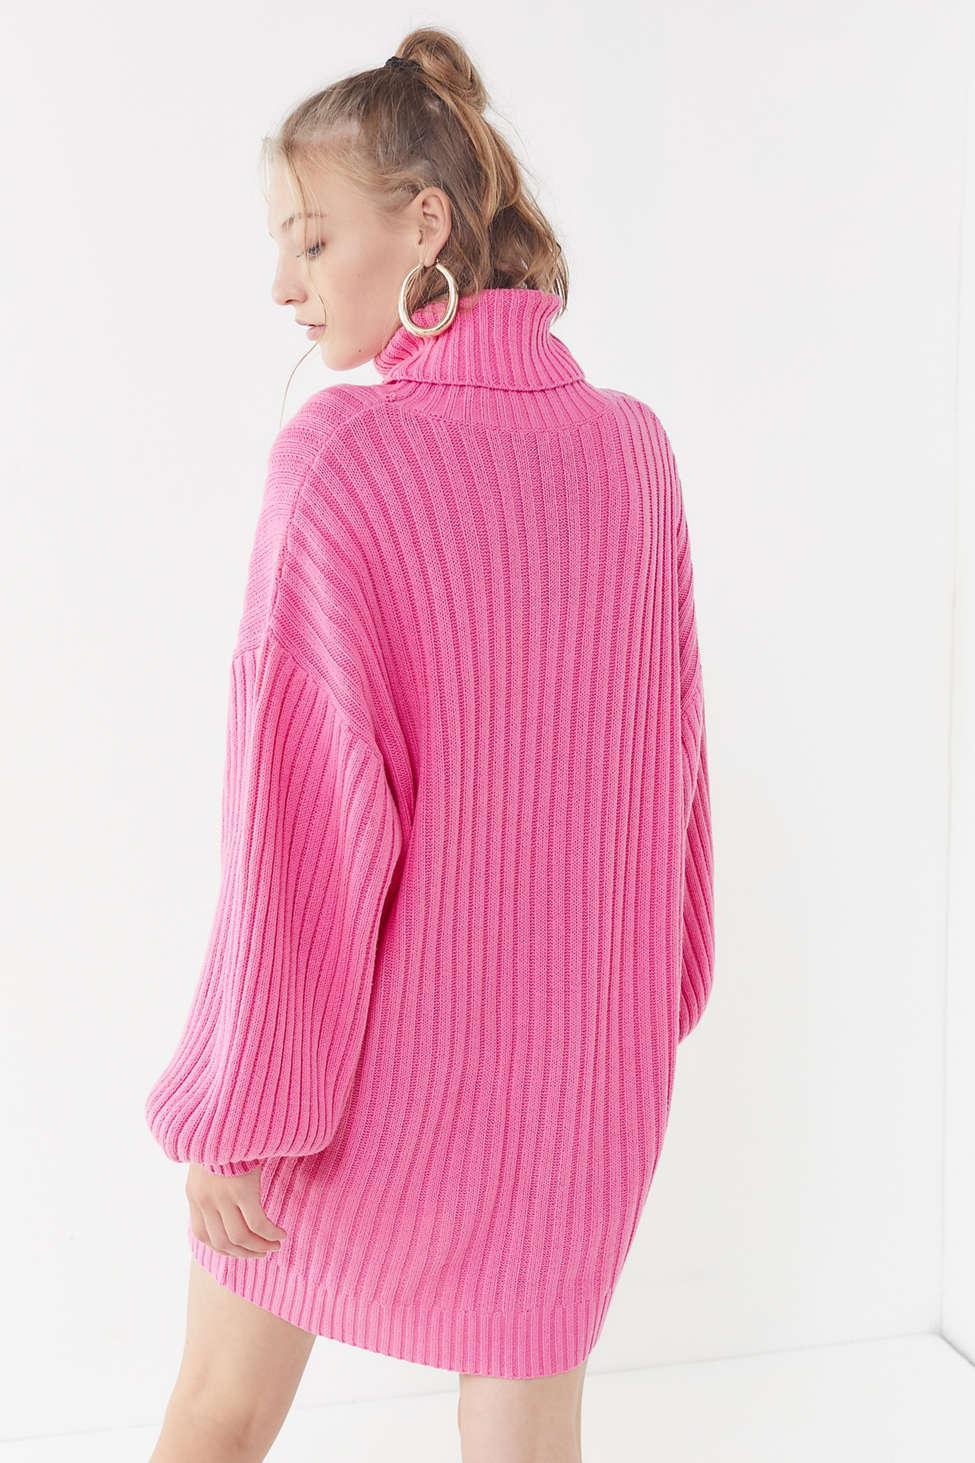 928b826744 Urban Outfitters Uo Jill Turtleneck Sweater Mini Dress in Pink - Lyst